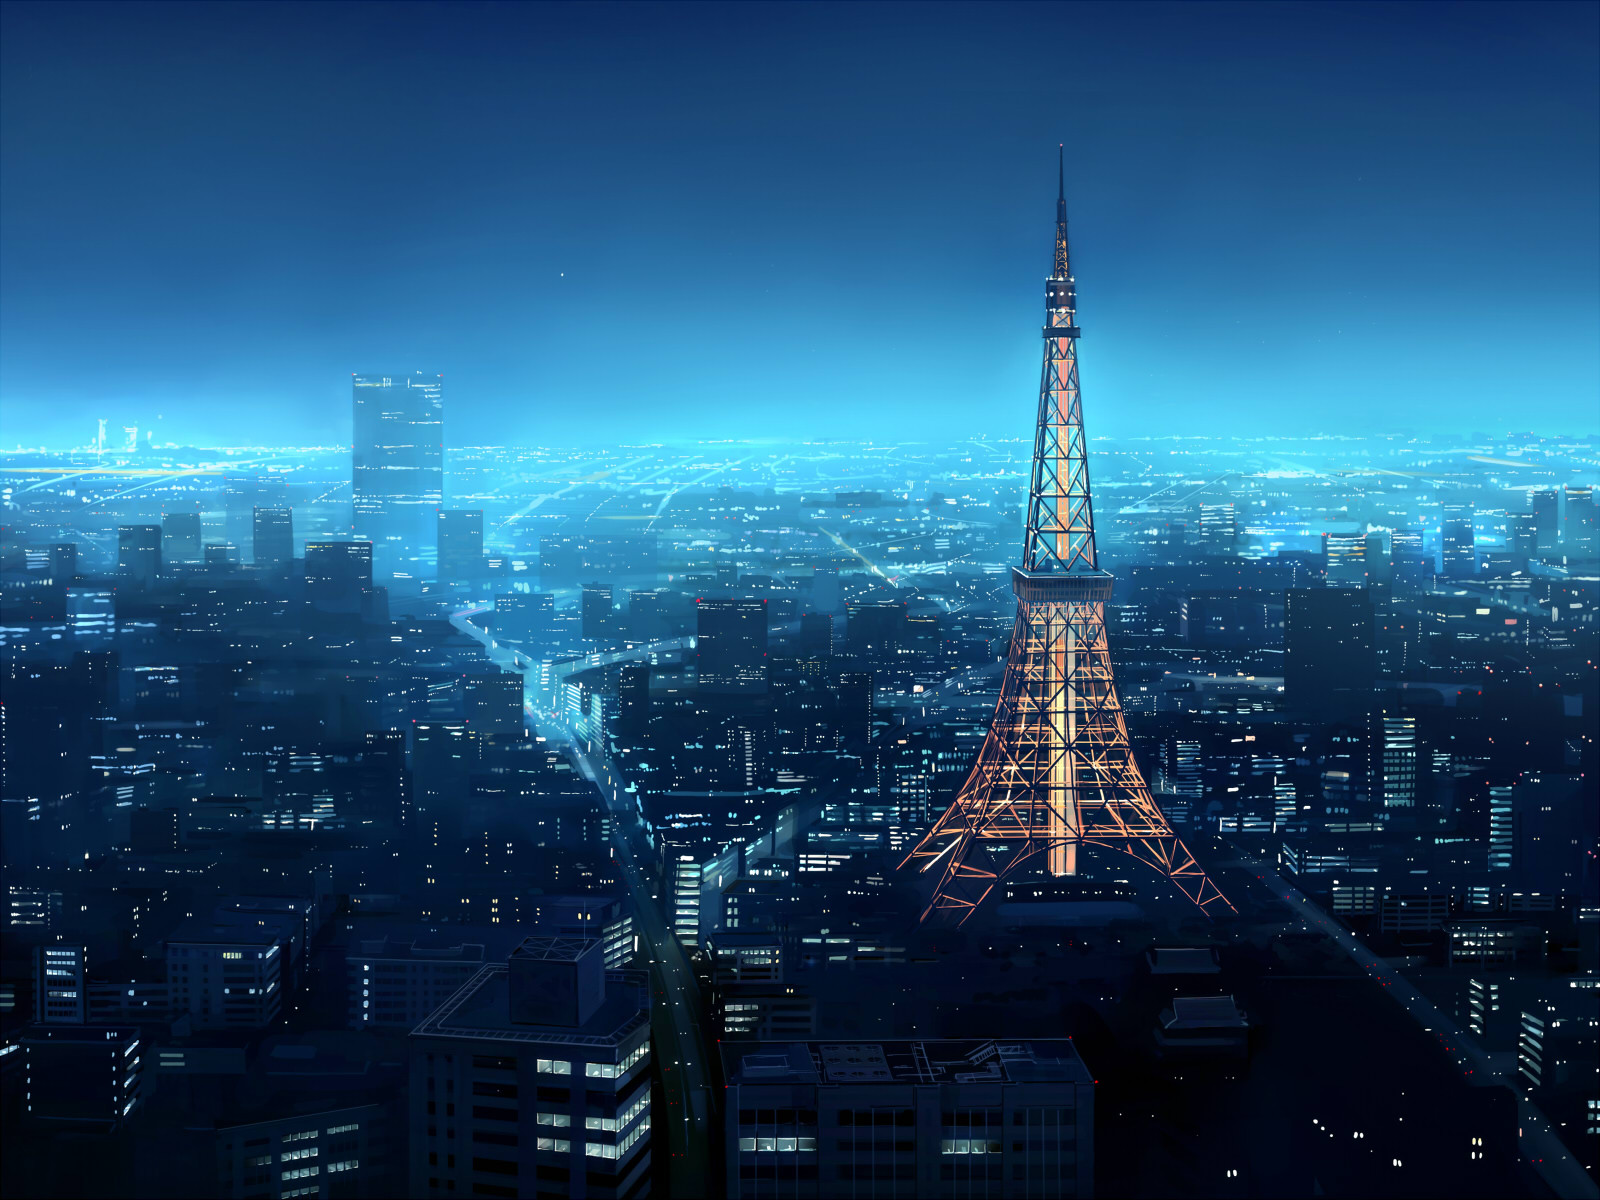 Tokyo Cool Picture Full Screen HD Wallpaper Wallpaper Tokyo 10211 1600x1200